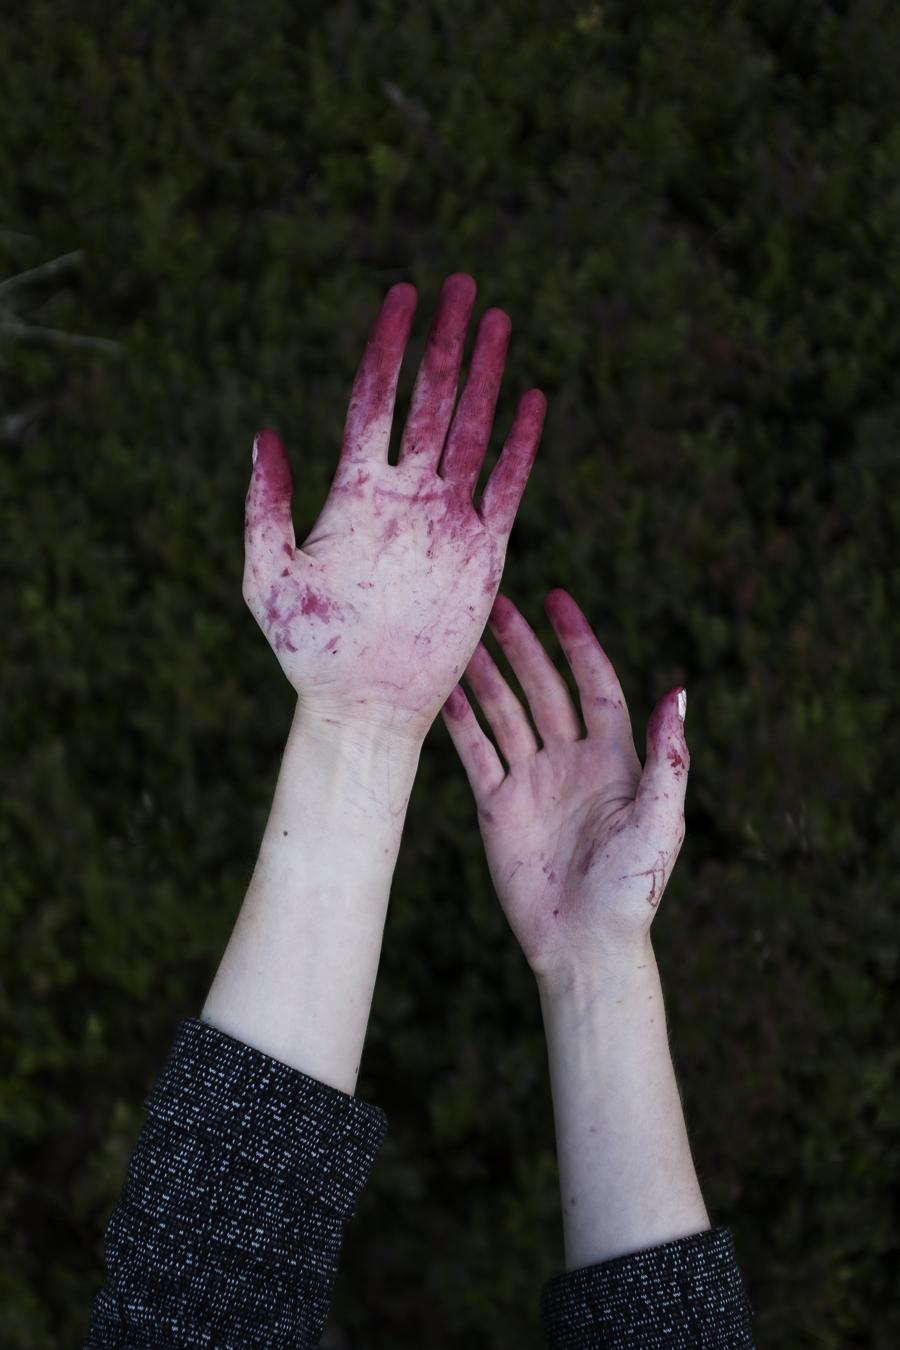 Hands Annette Pehrsson